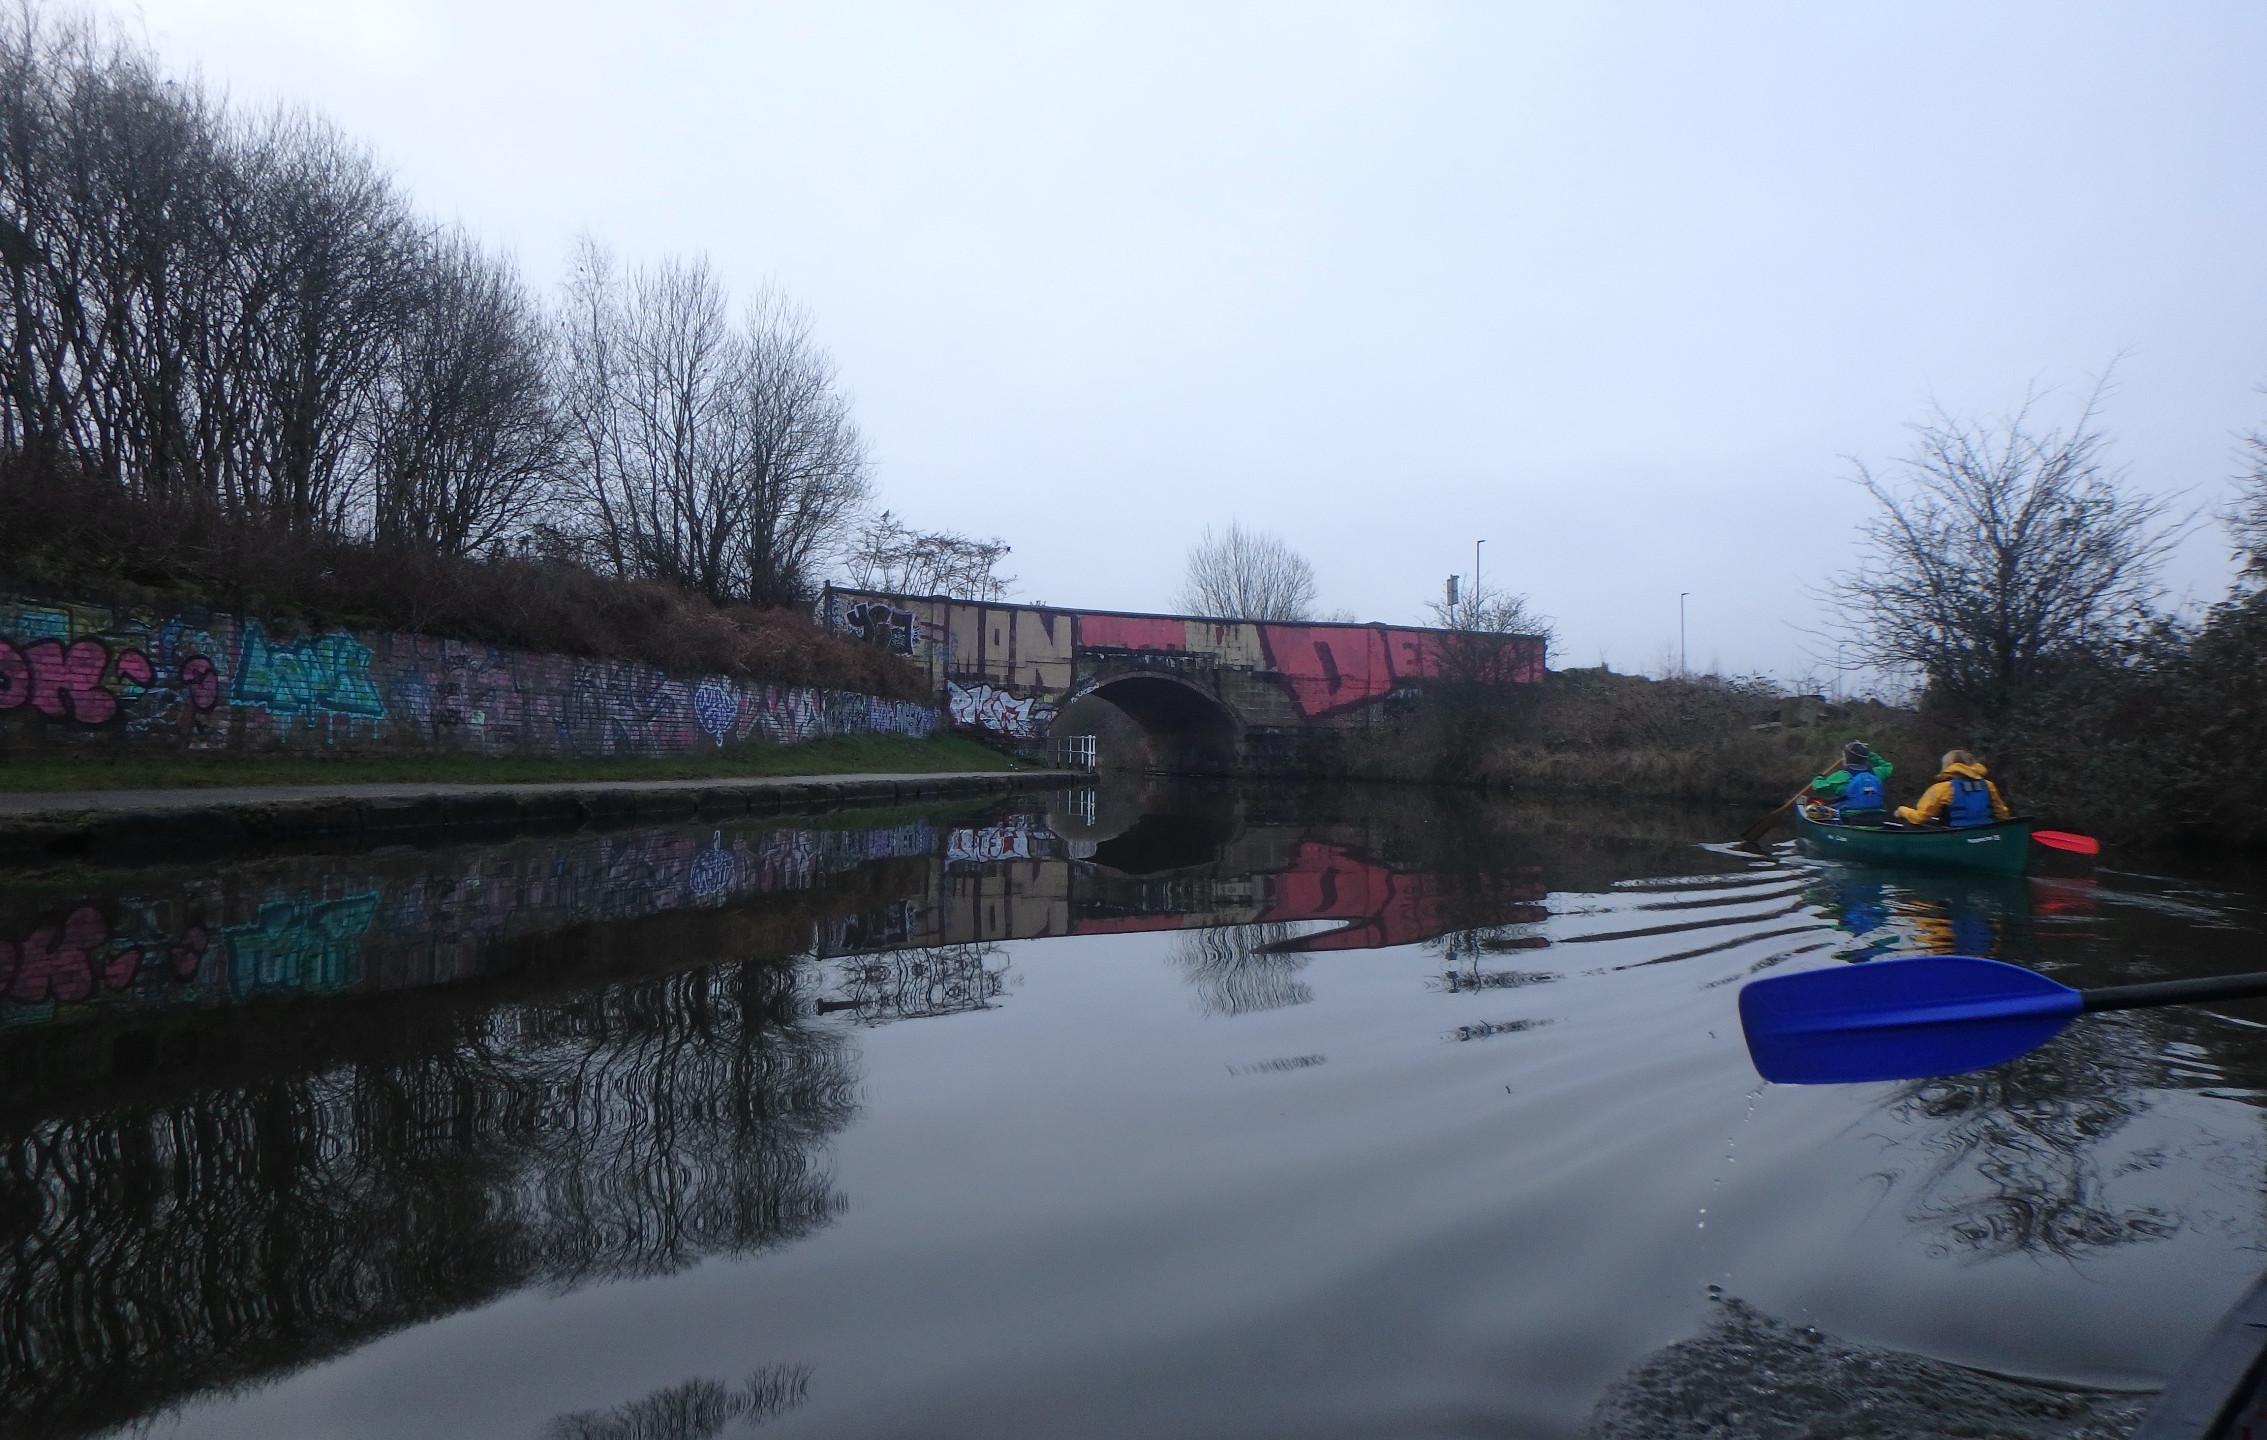 Canoeing reflection and graffitti